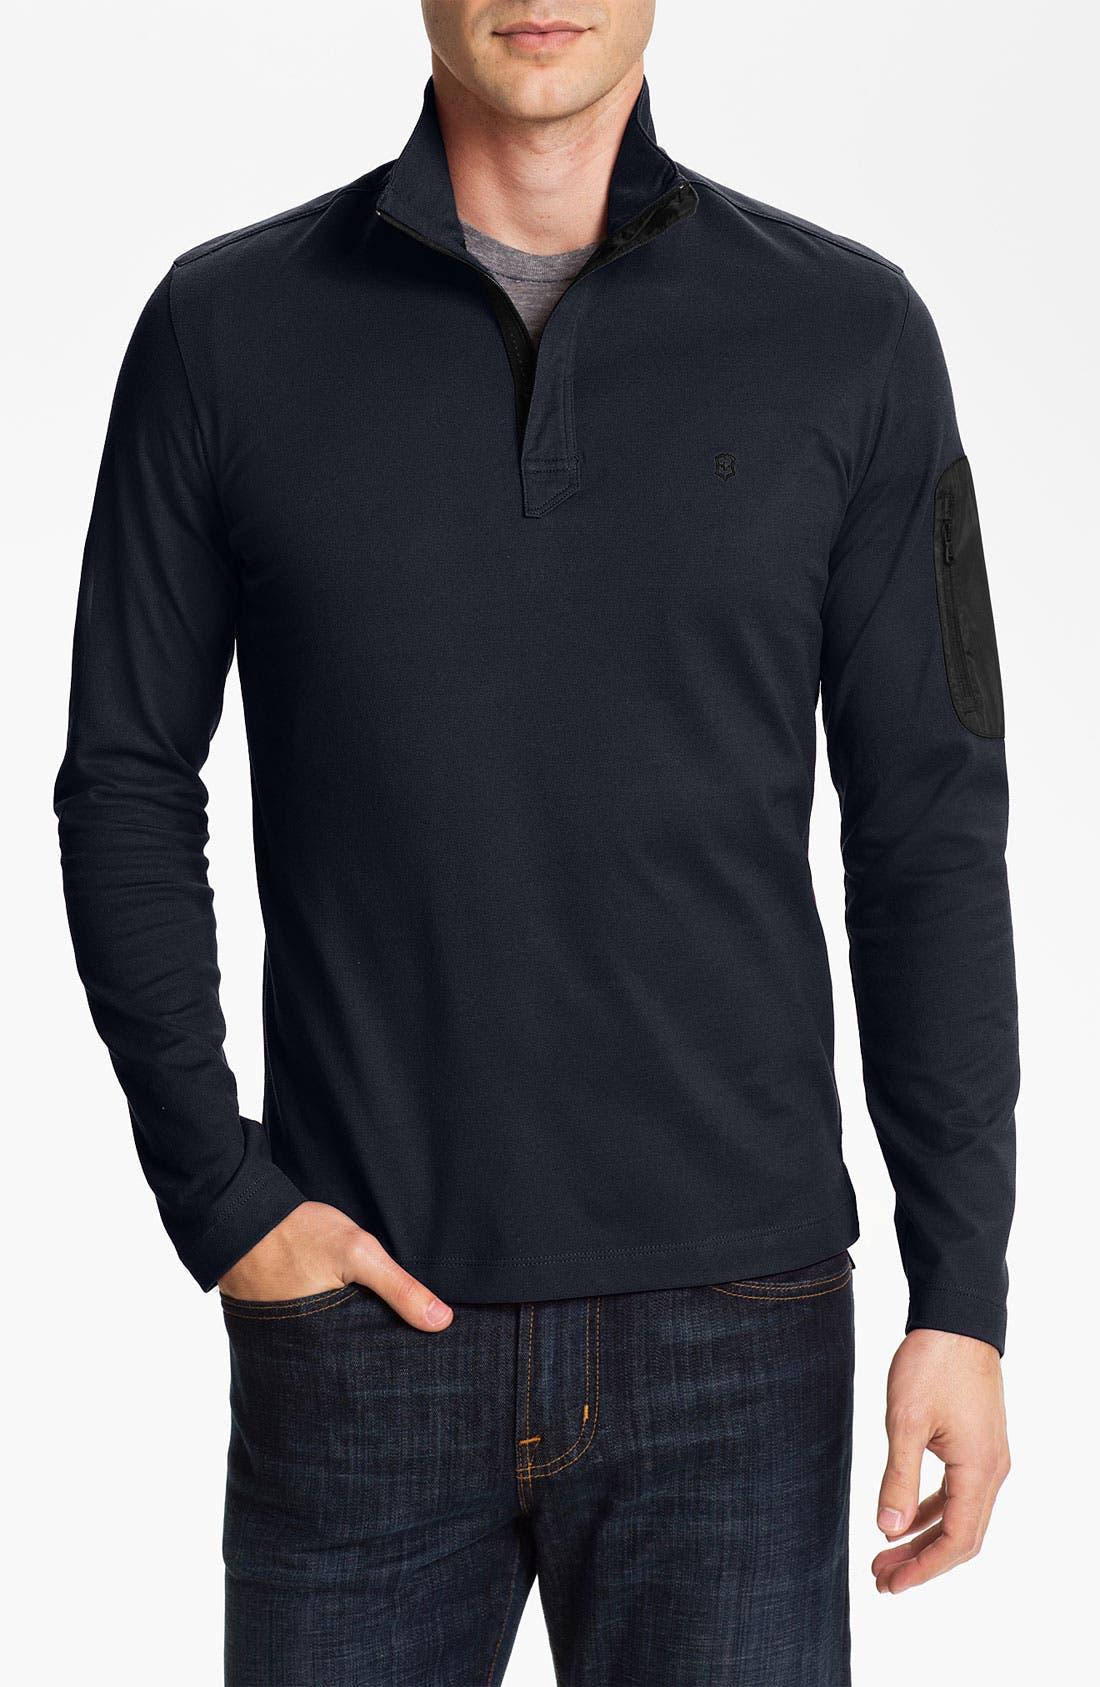 Alternate Image 1 Selected - Victorinox Swiss Army® Piqué Knit Quarter Zip Shirt (Online Exclusive)